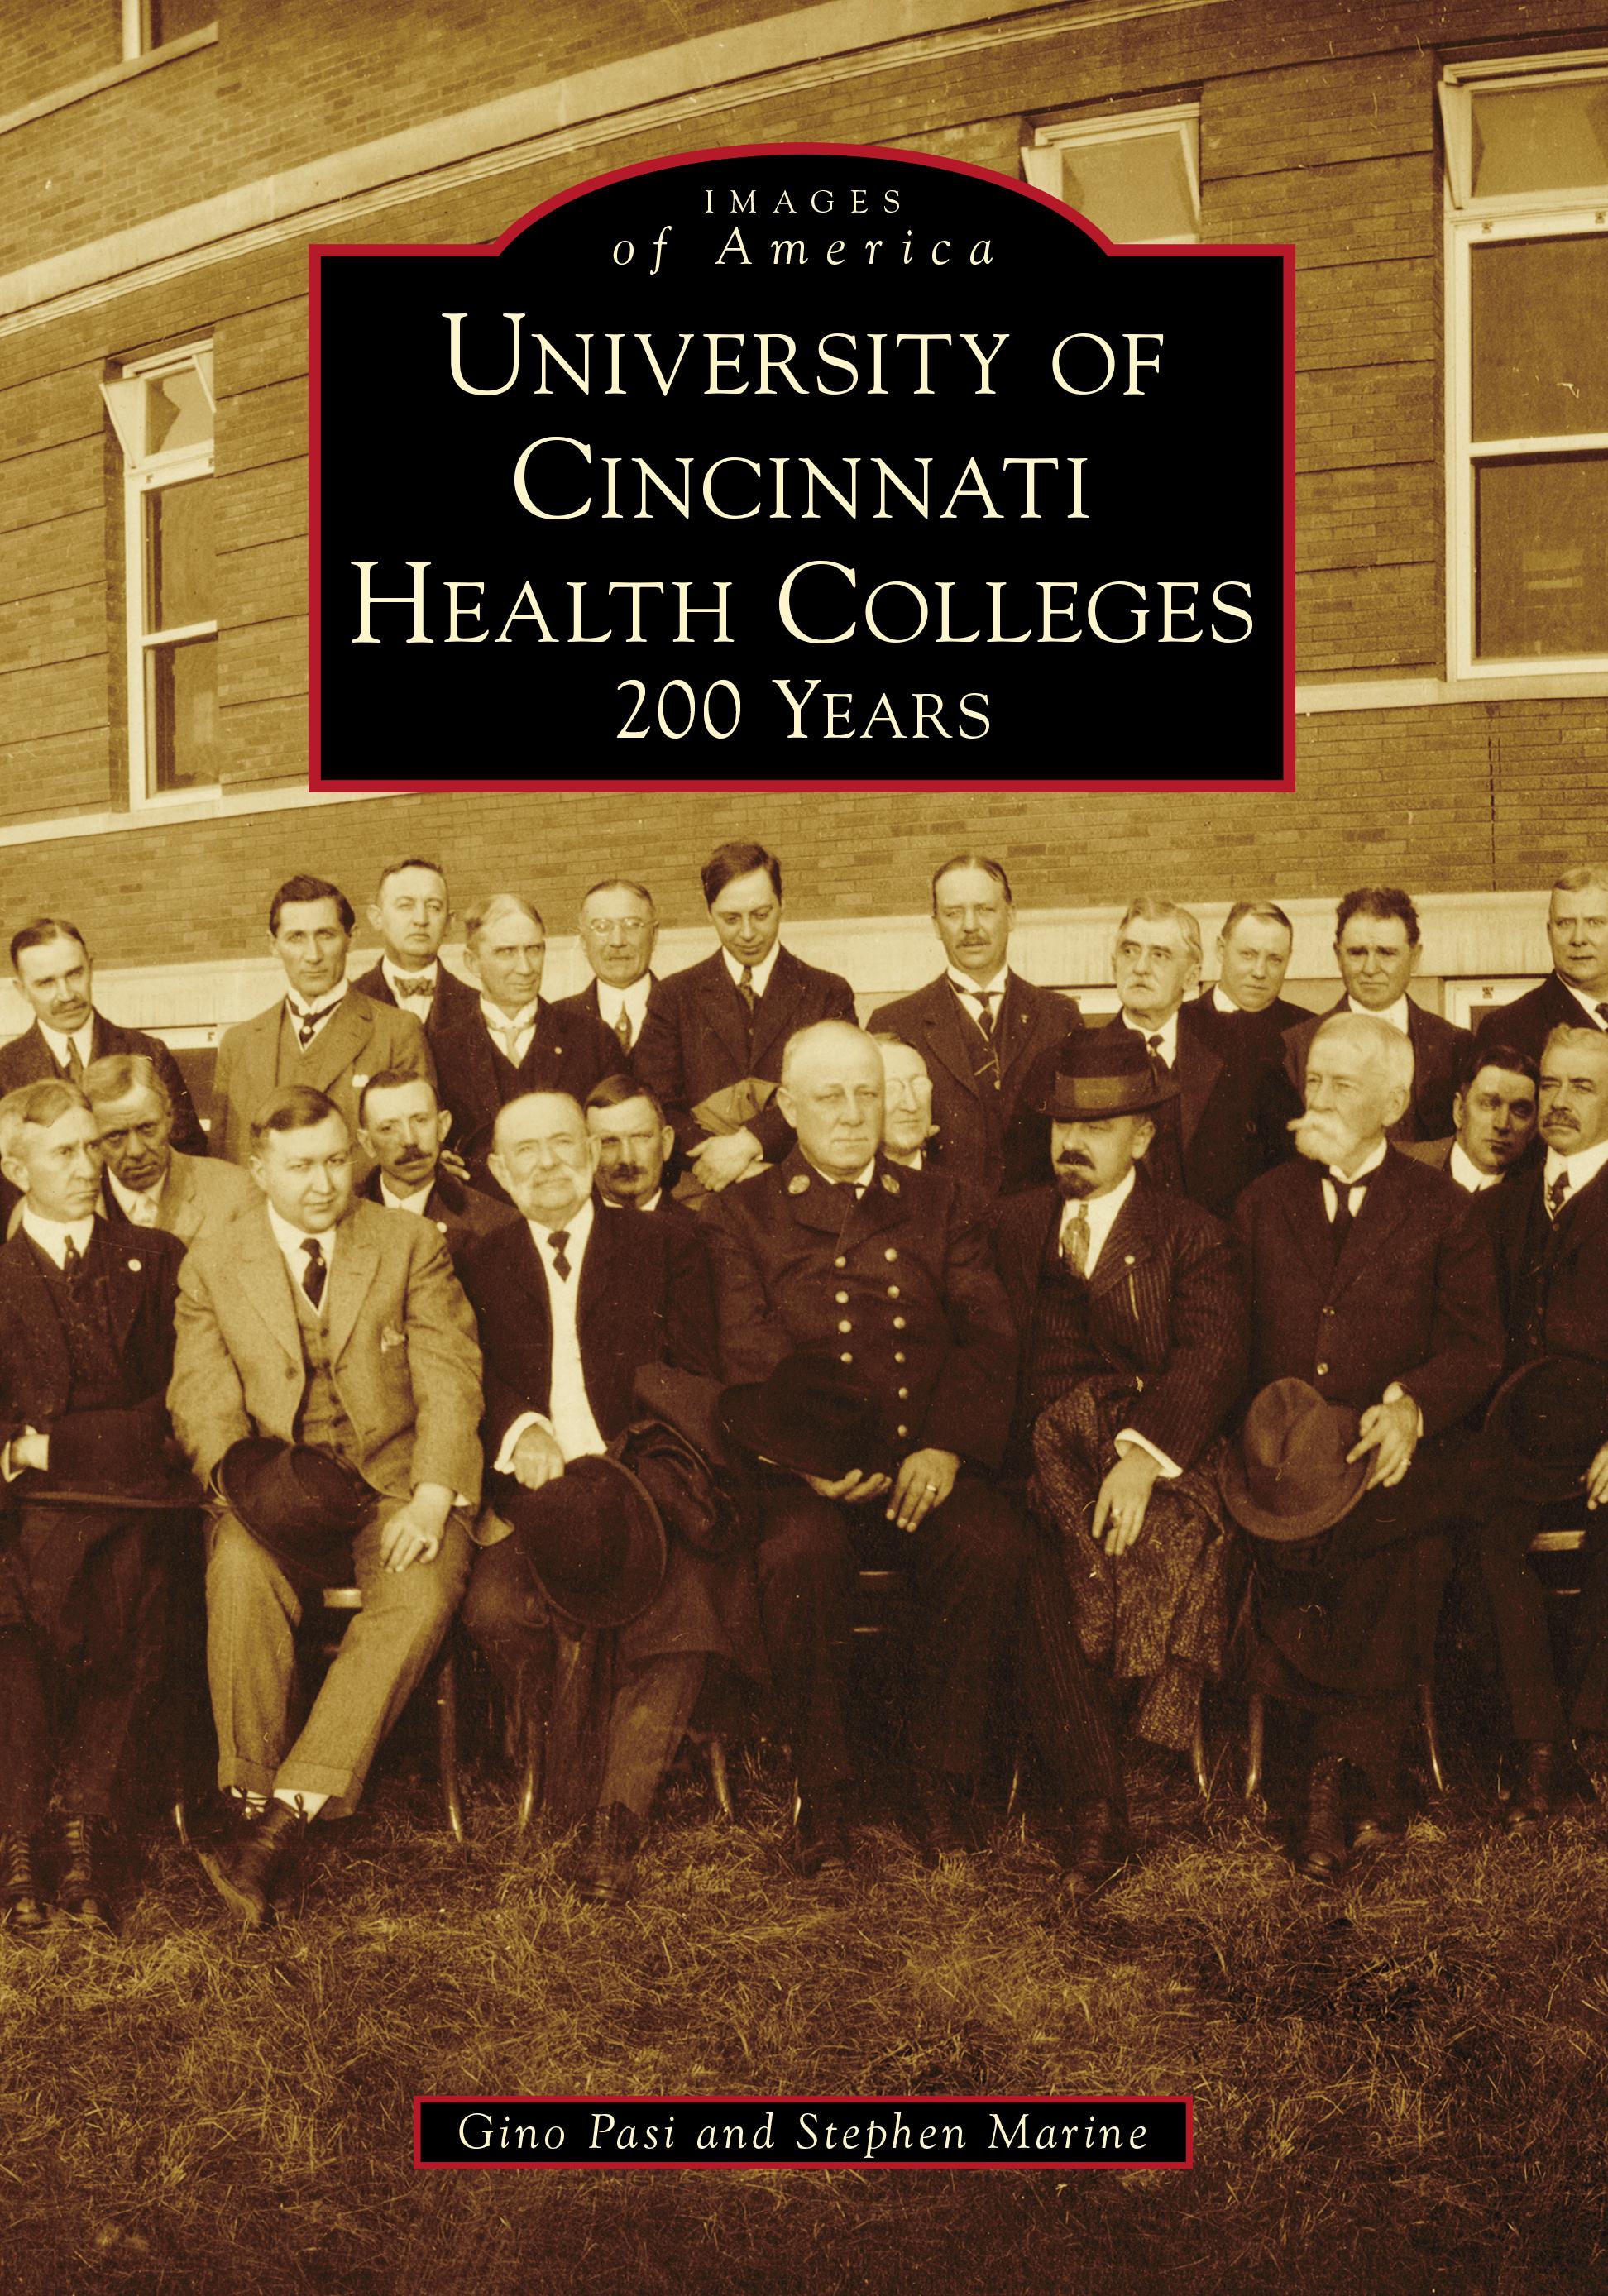 University of Cincinnati Health Colleges: 200 Years